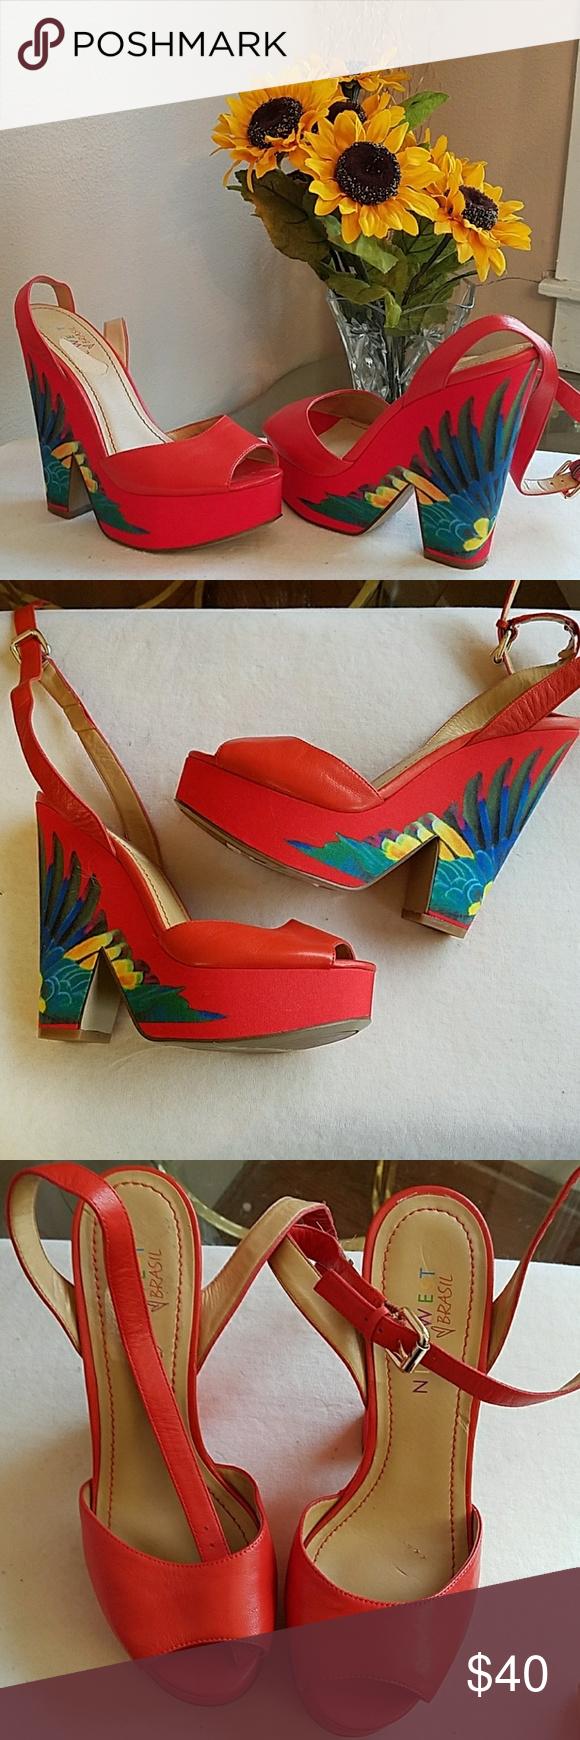 82d76c34d9203 NWT Nine West Brazil platform heels Gorgeous Nine West Brazil platform  heels. Never worn Flaws inside straps are peeling (from storage) pics 7   8 Nine  West ...